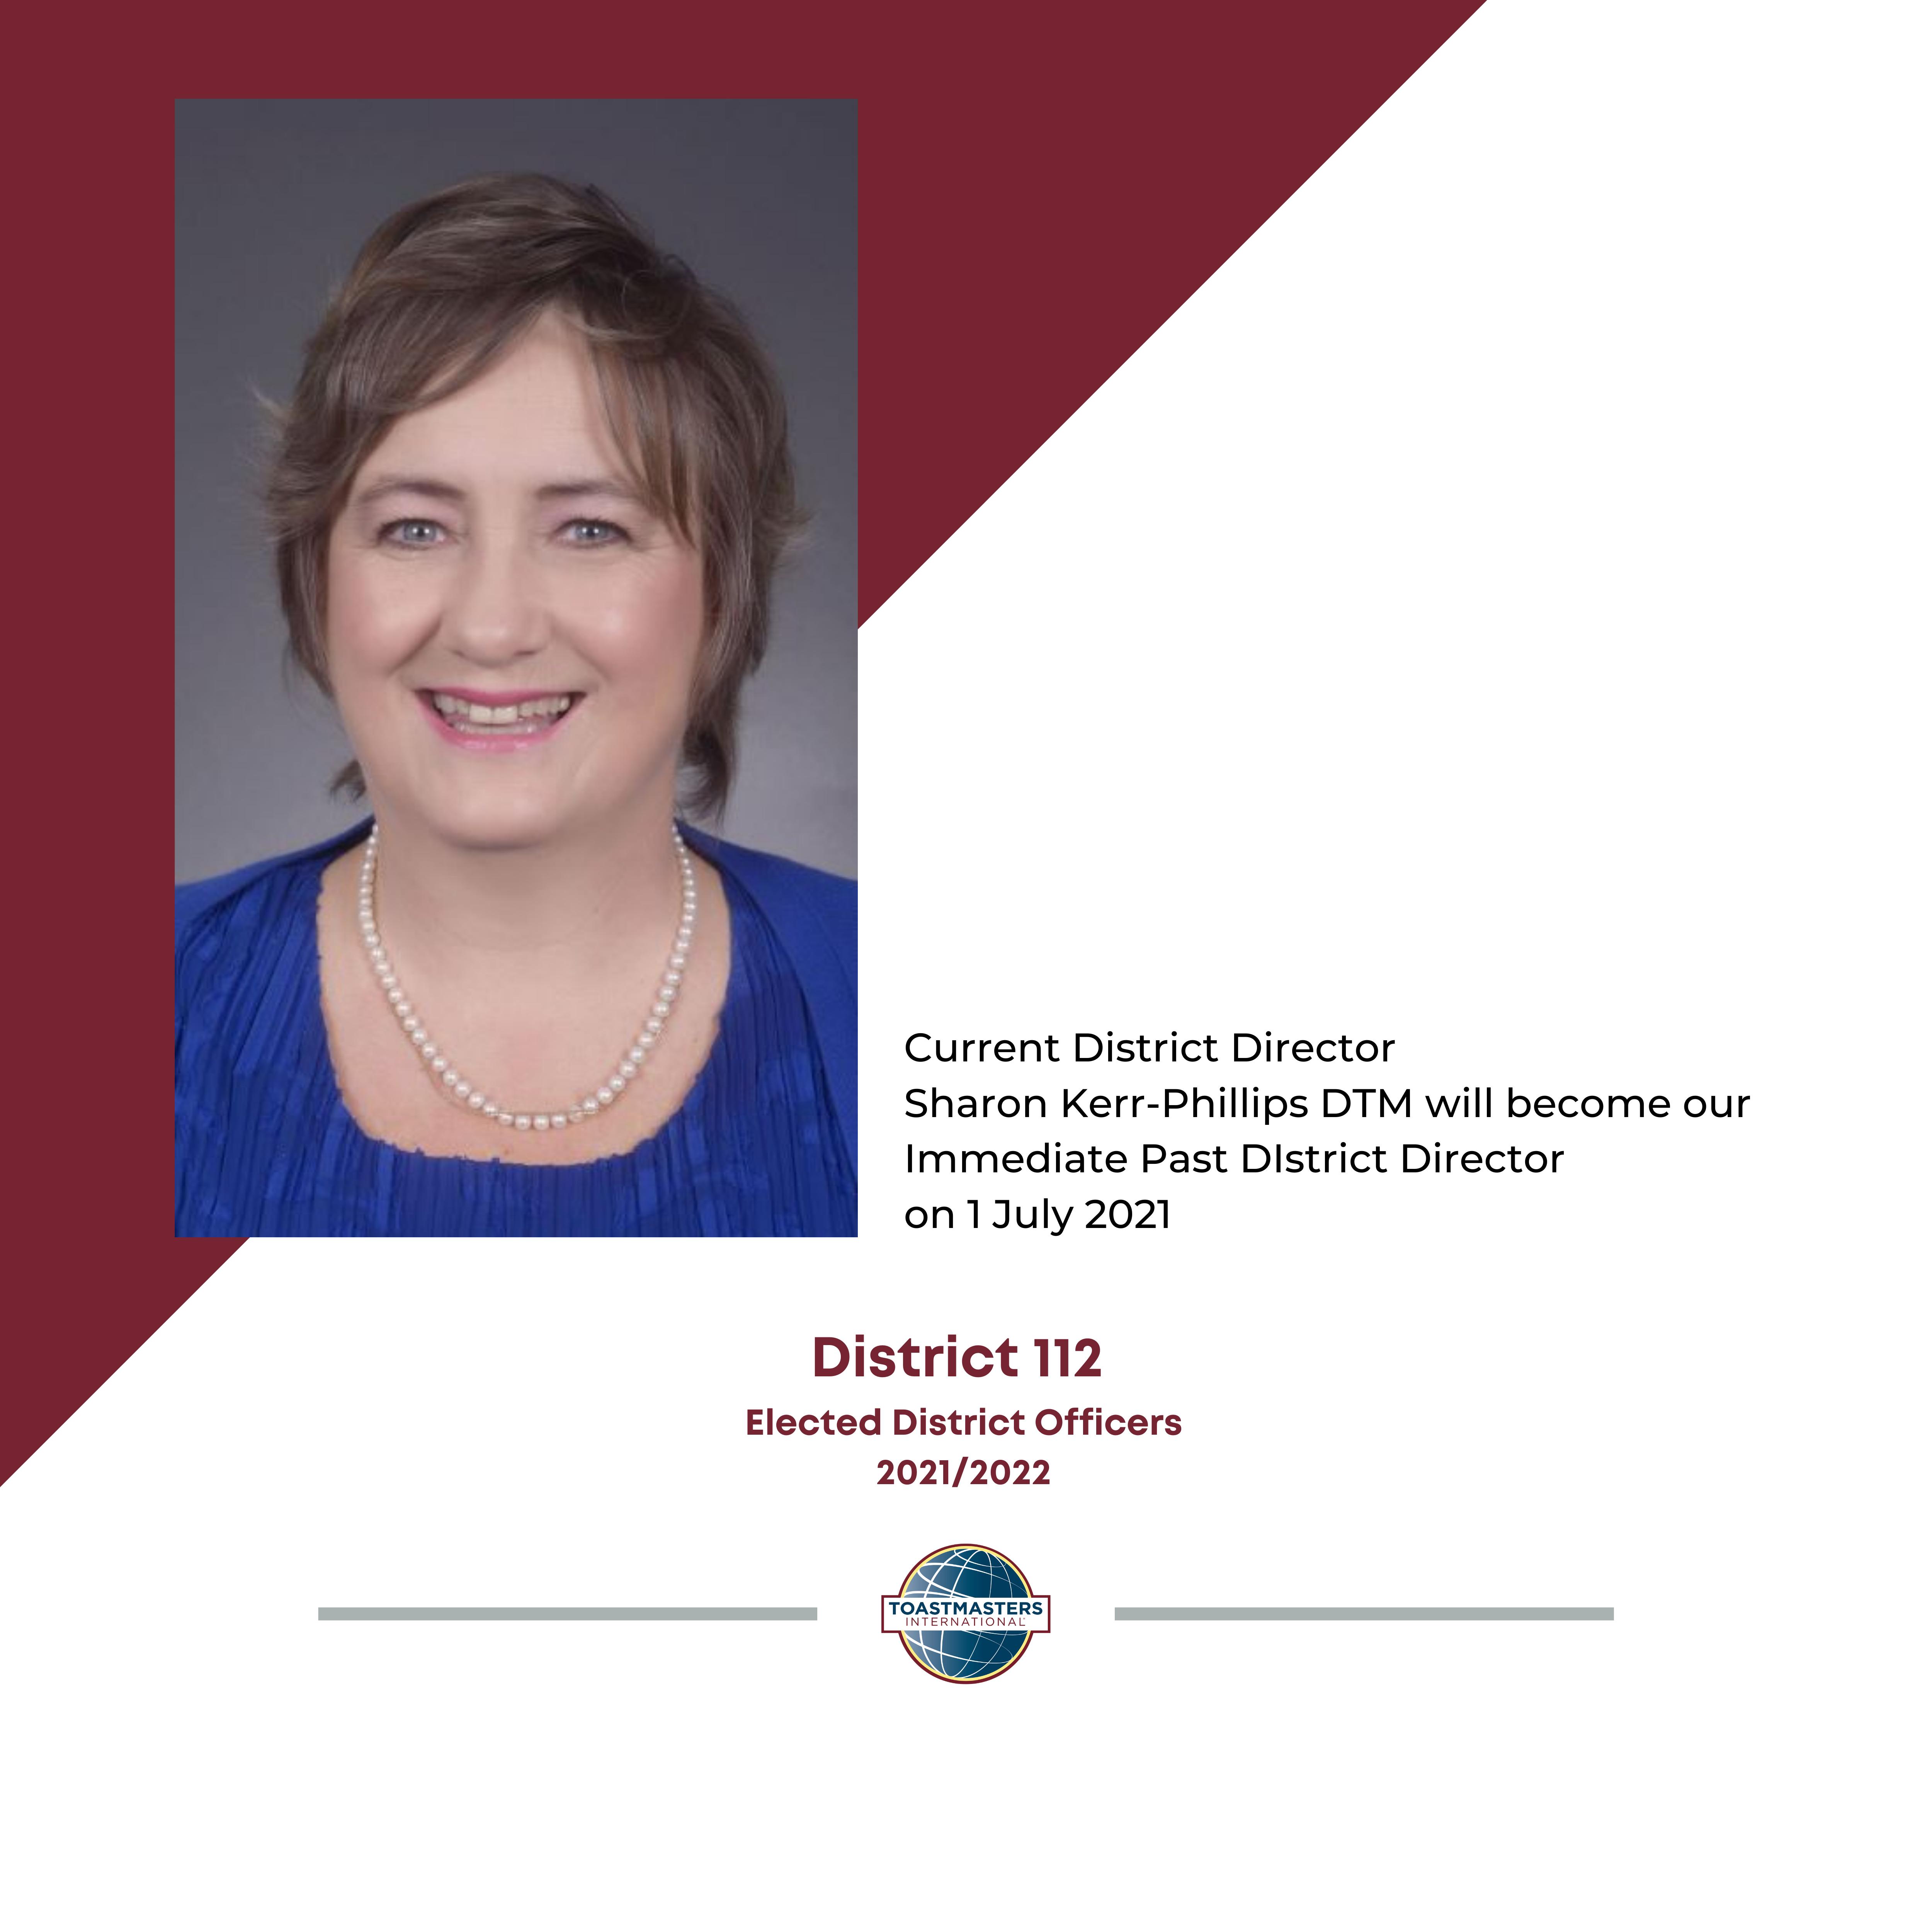 Immediate Past DIstrict Director Sharon Kerr-Phillips DTM